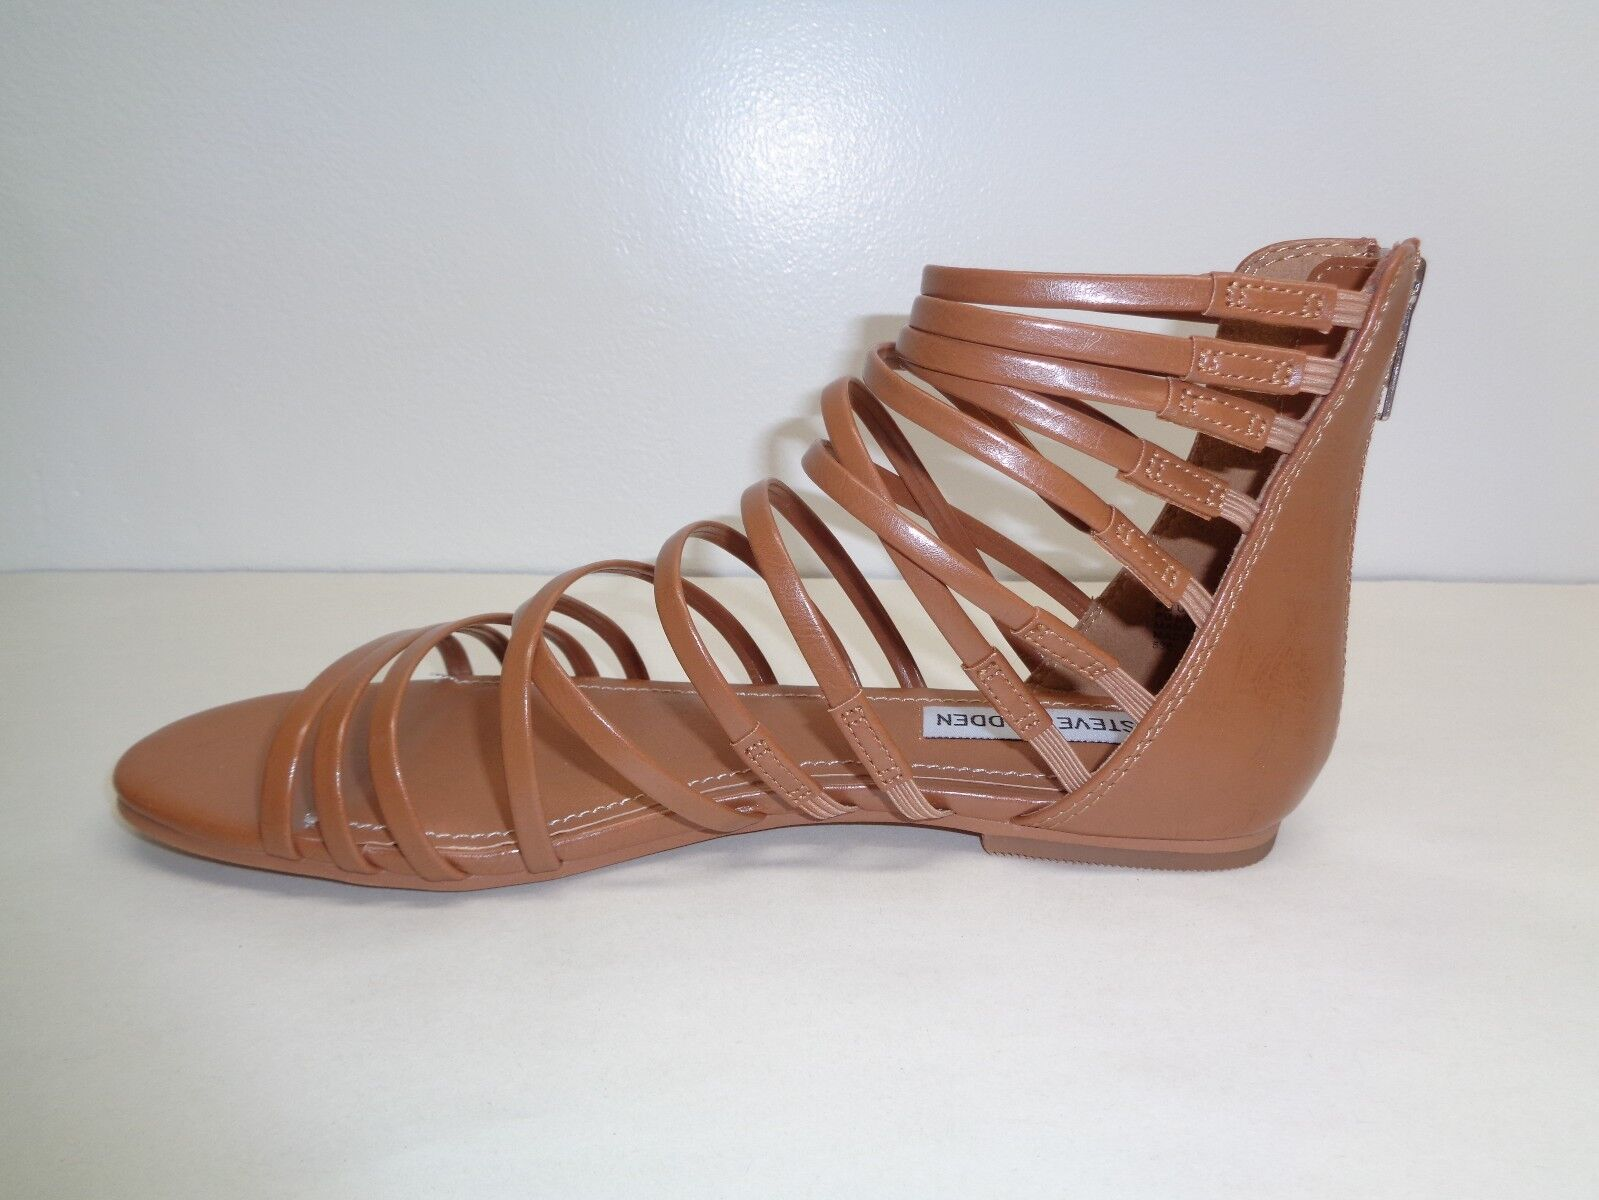 Steve Madden Womens Kirsten Tan Platform Sandals Shoes 9 Medium BHFO 6380 B,M